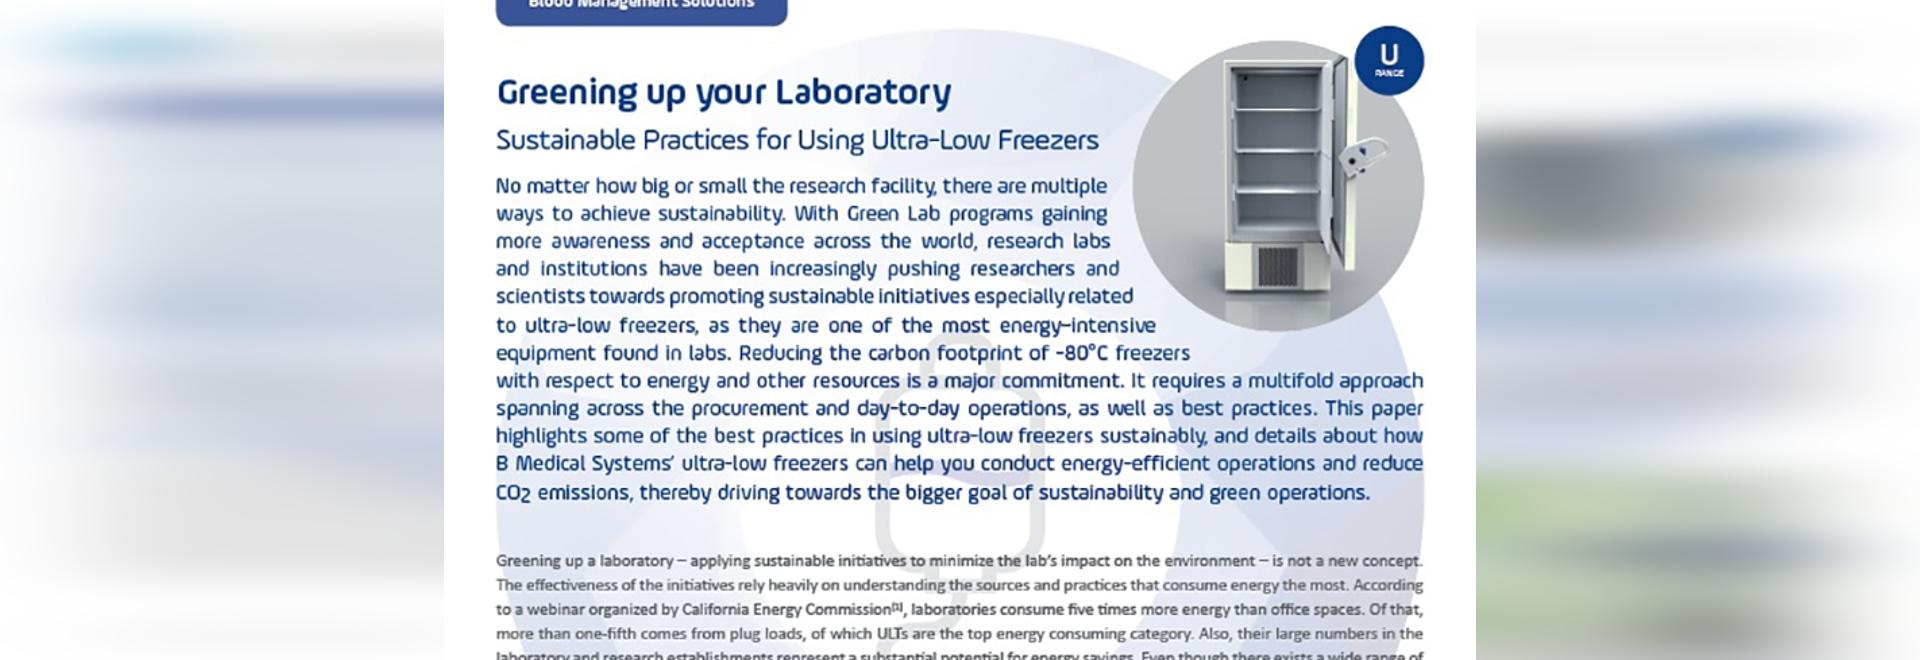 Greening up your laboratory